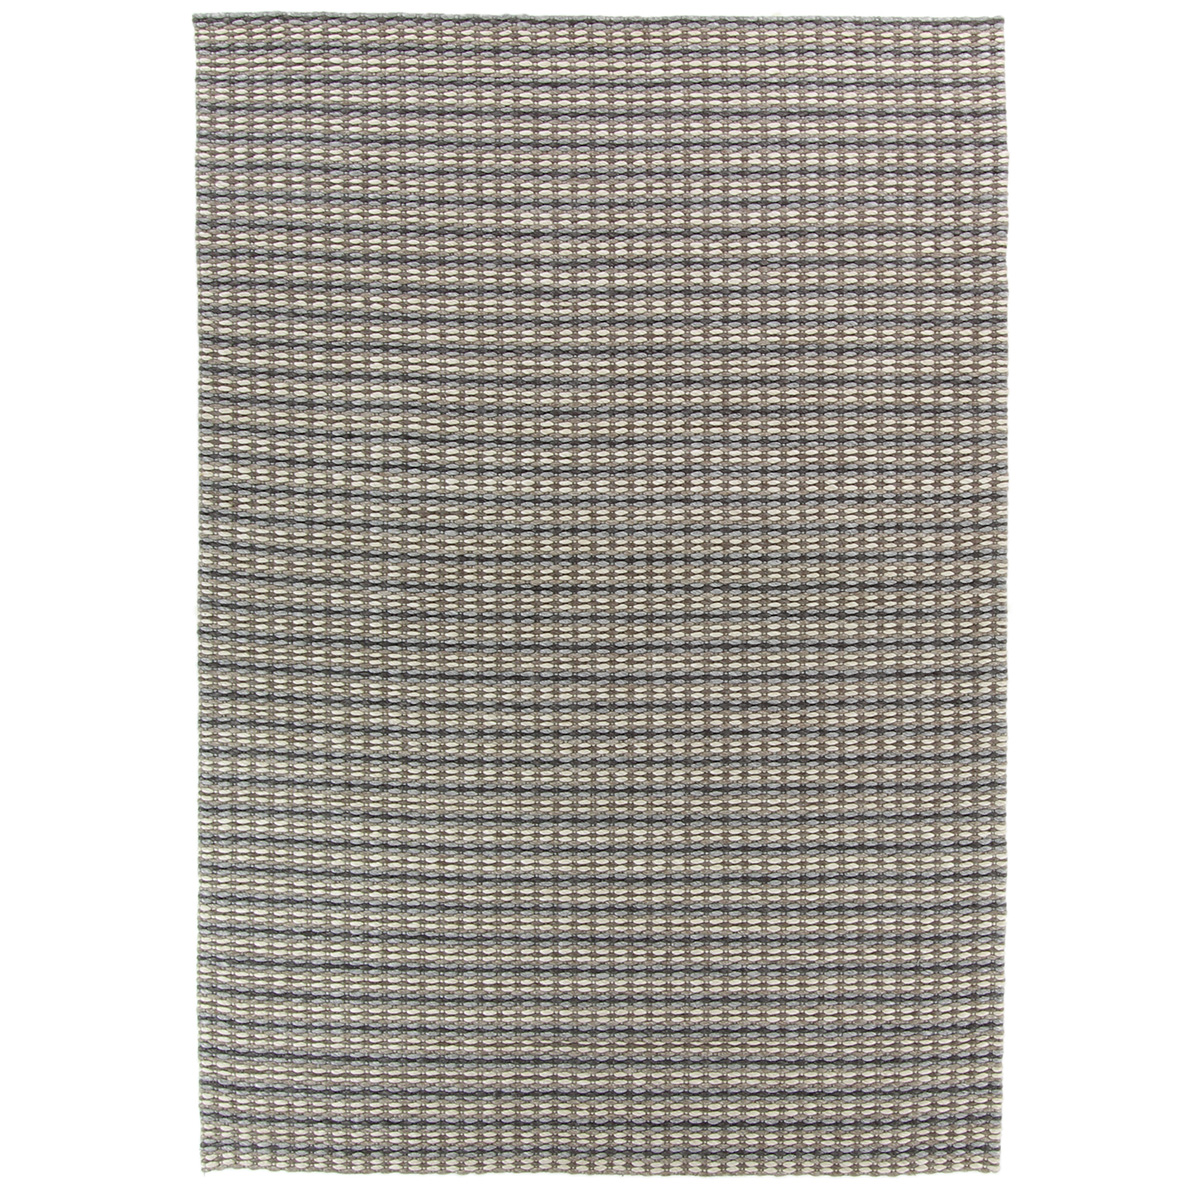 Vloerkleed Brinker Volt 03 | 160 x 230 cm